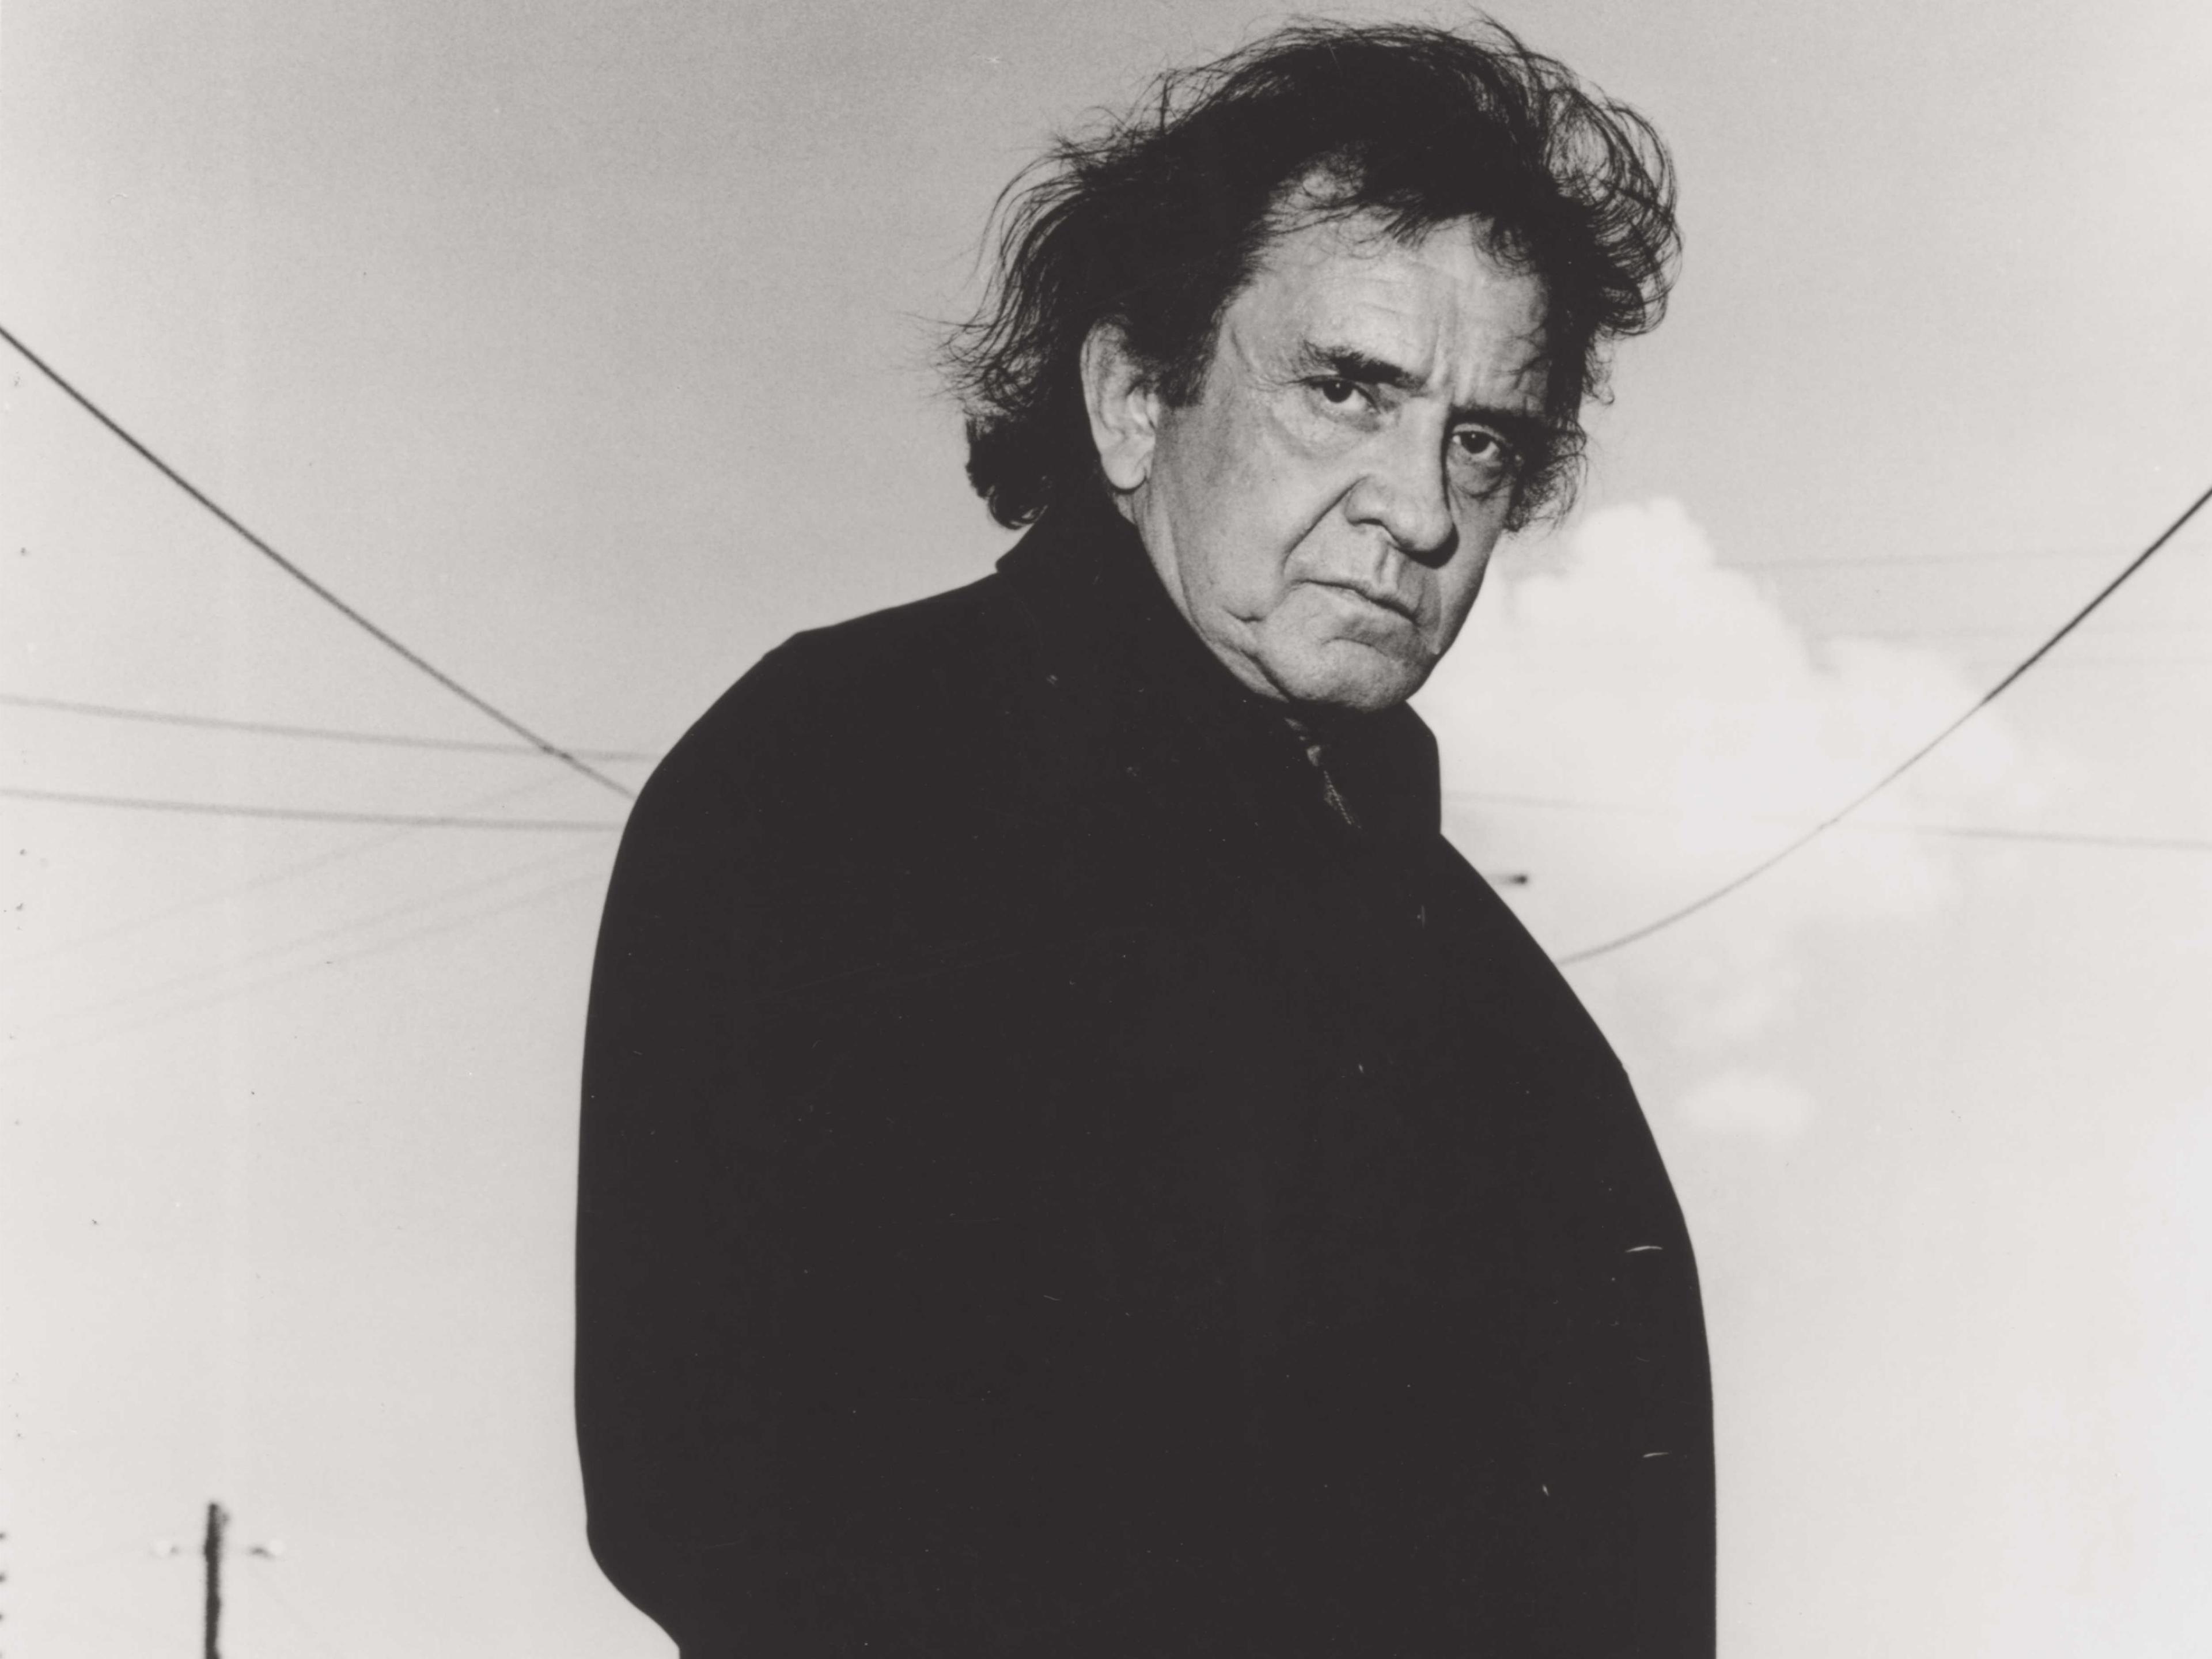 Johnny Cash on Amazon Music